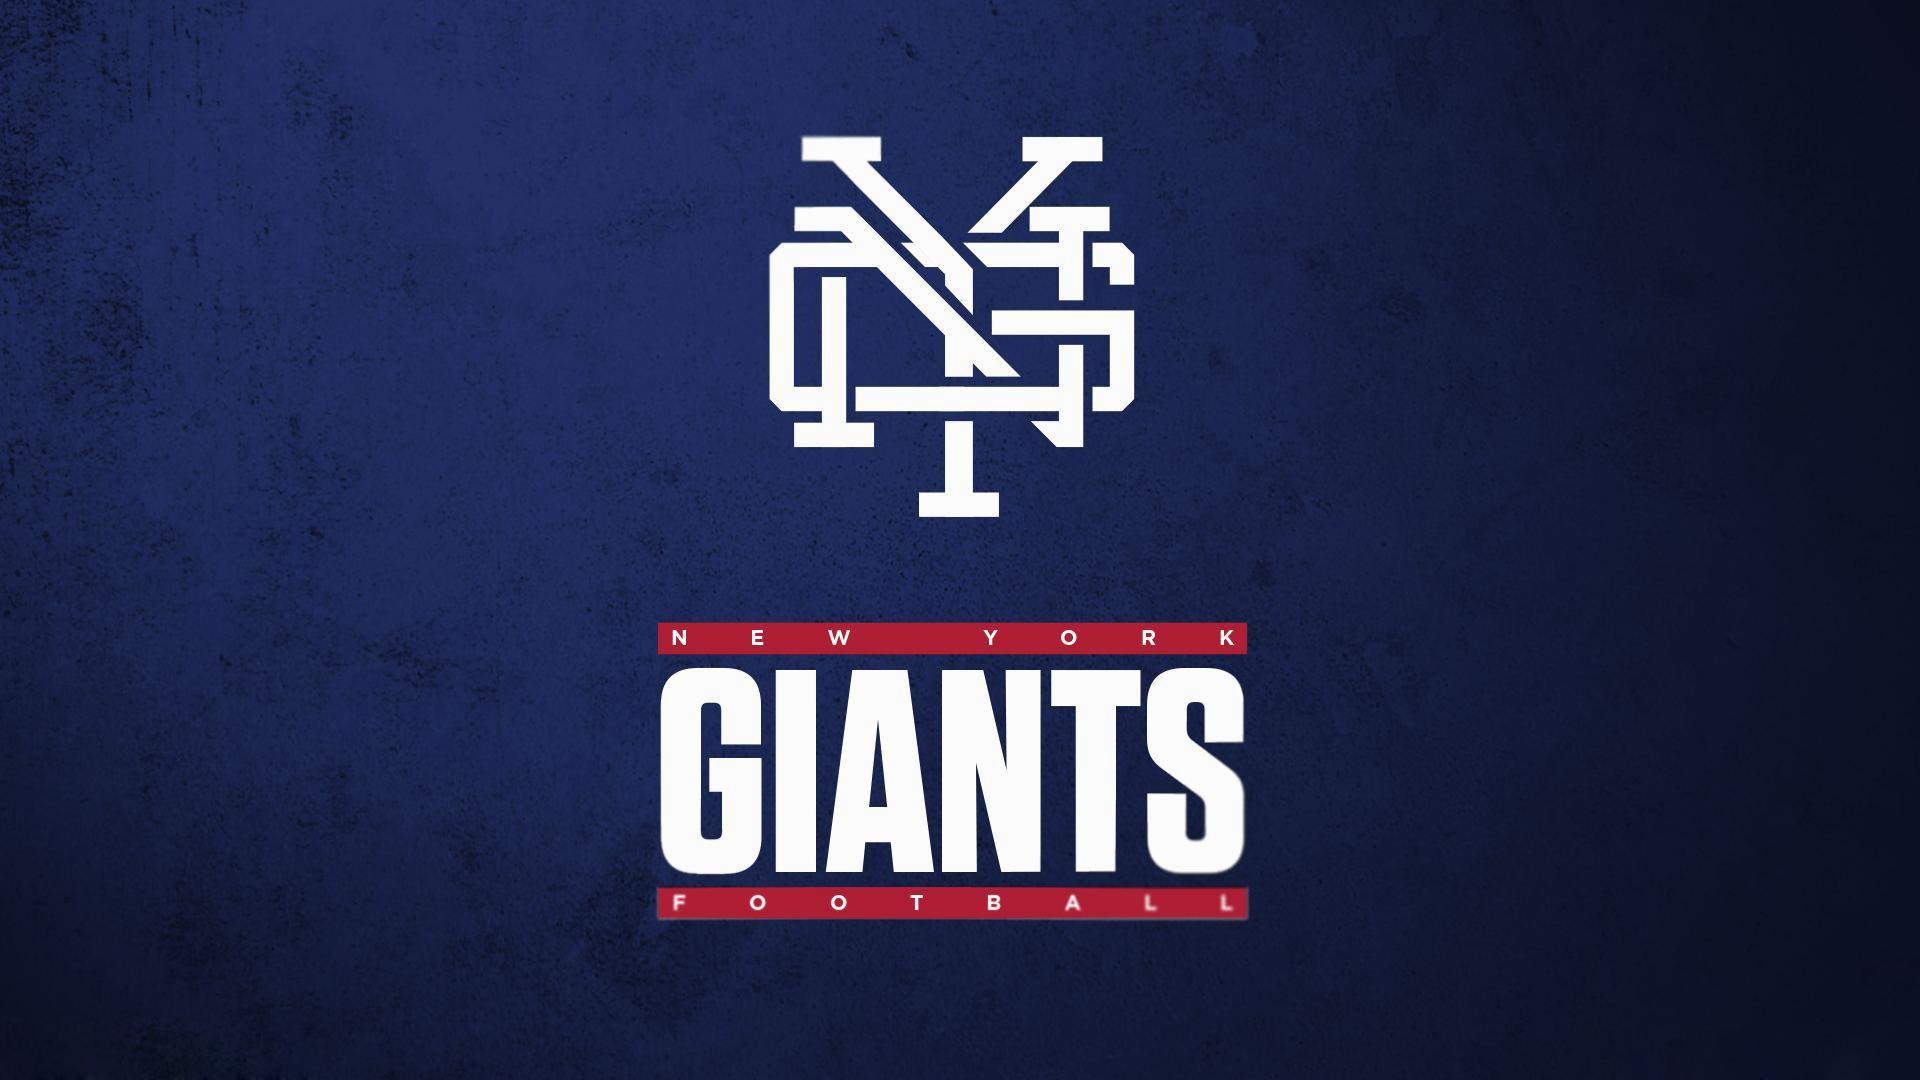 san francisco giants logo wallpapers